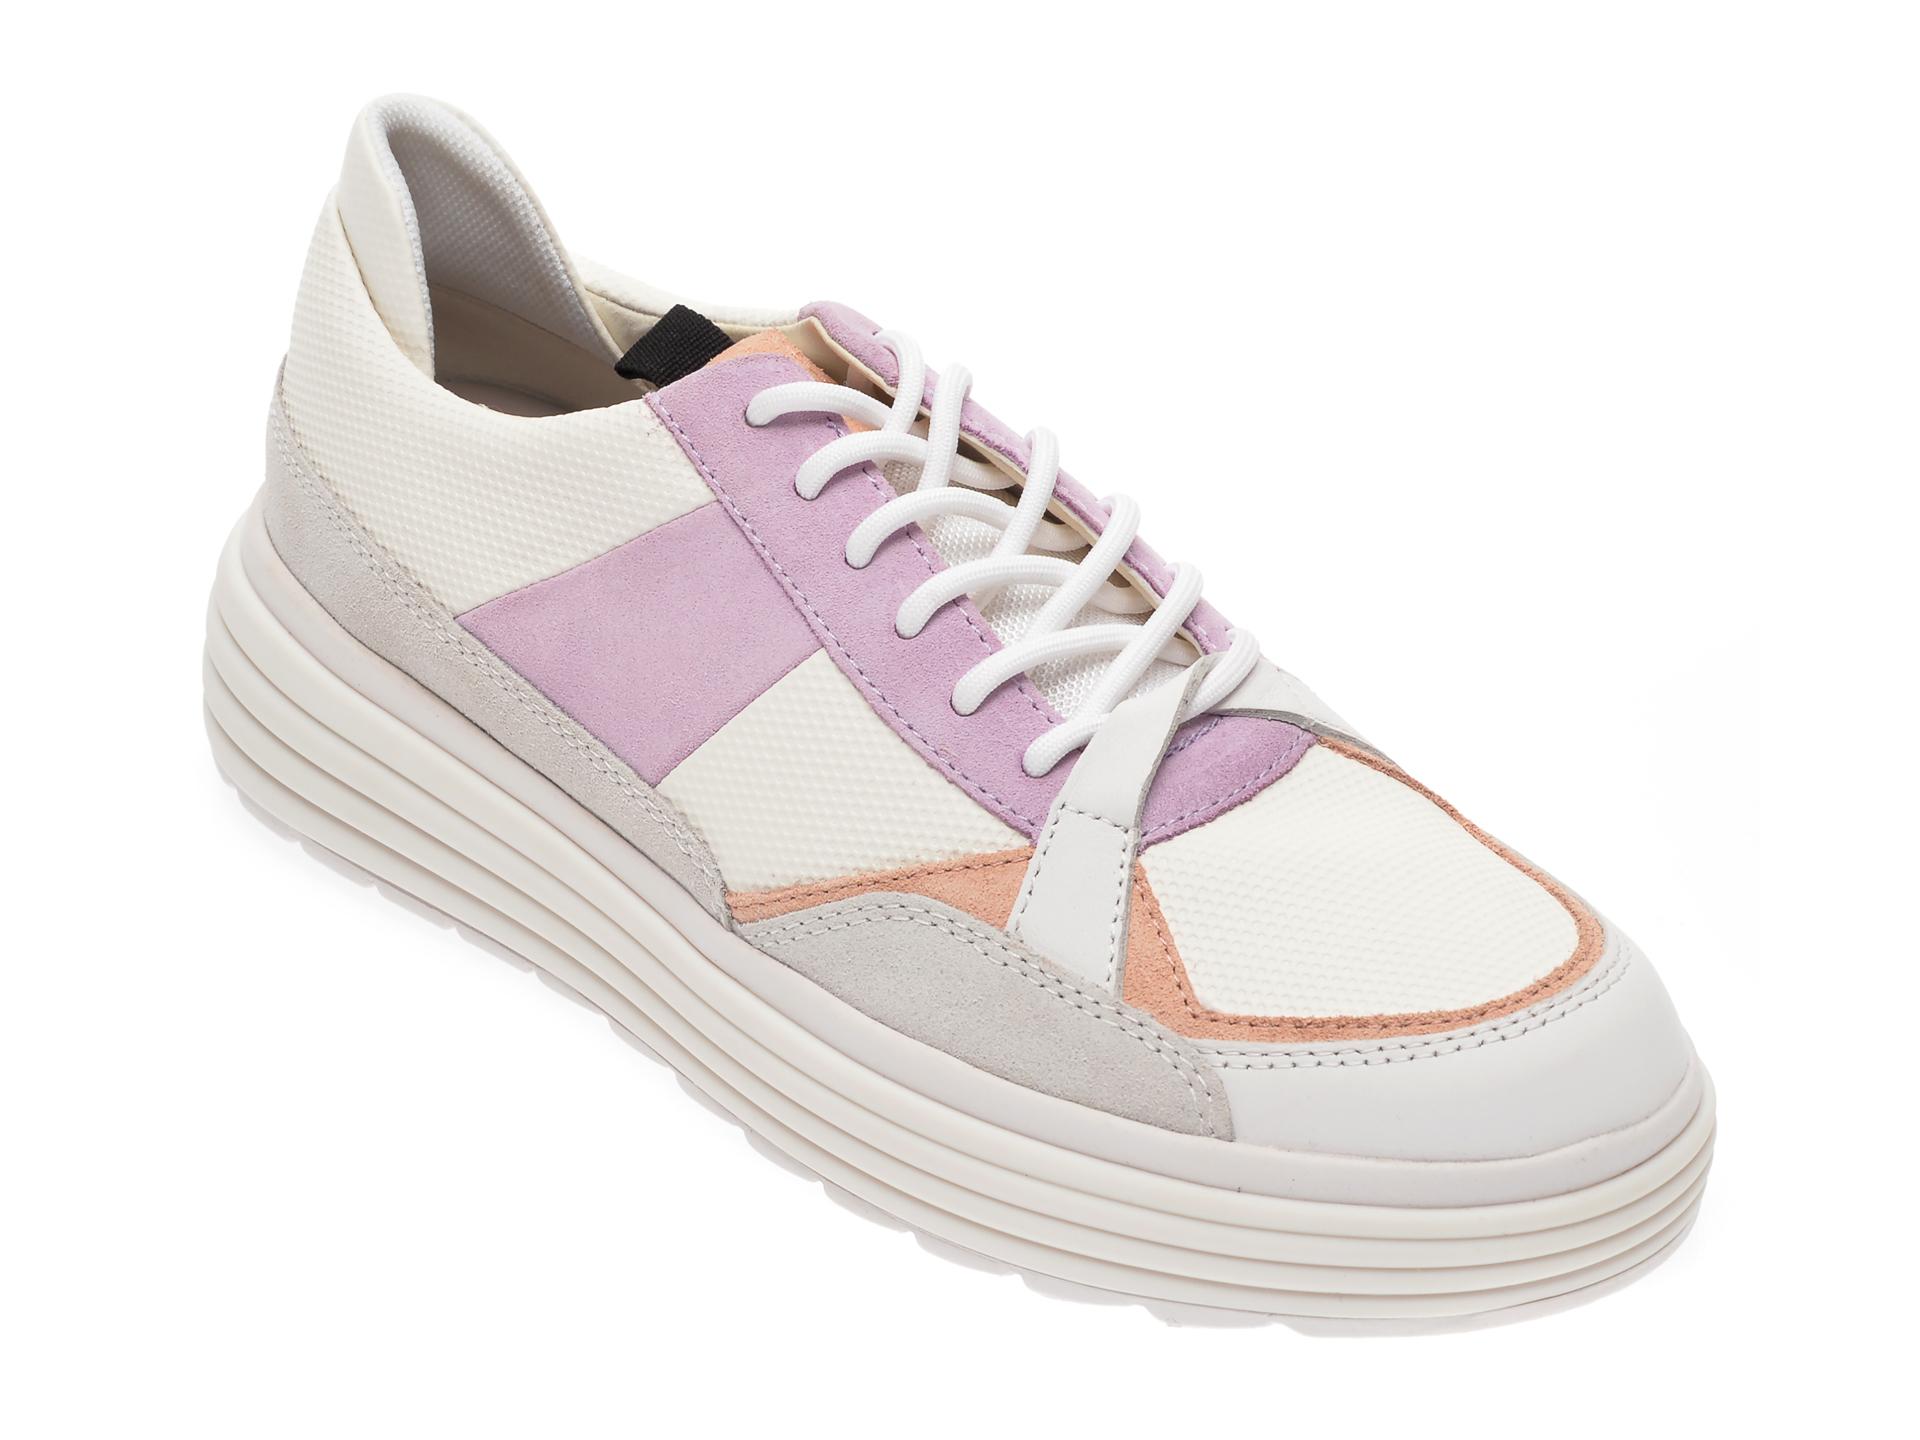 Pantofi sport GEOX albi, J02BGE, din material textil si piele ecologica